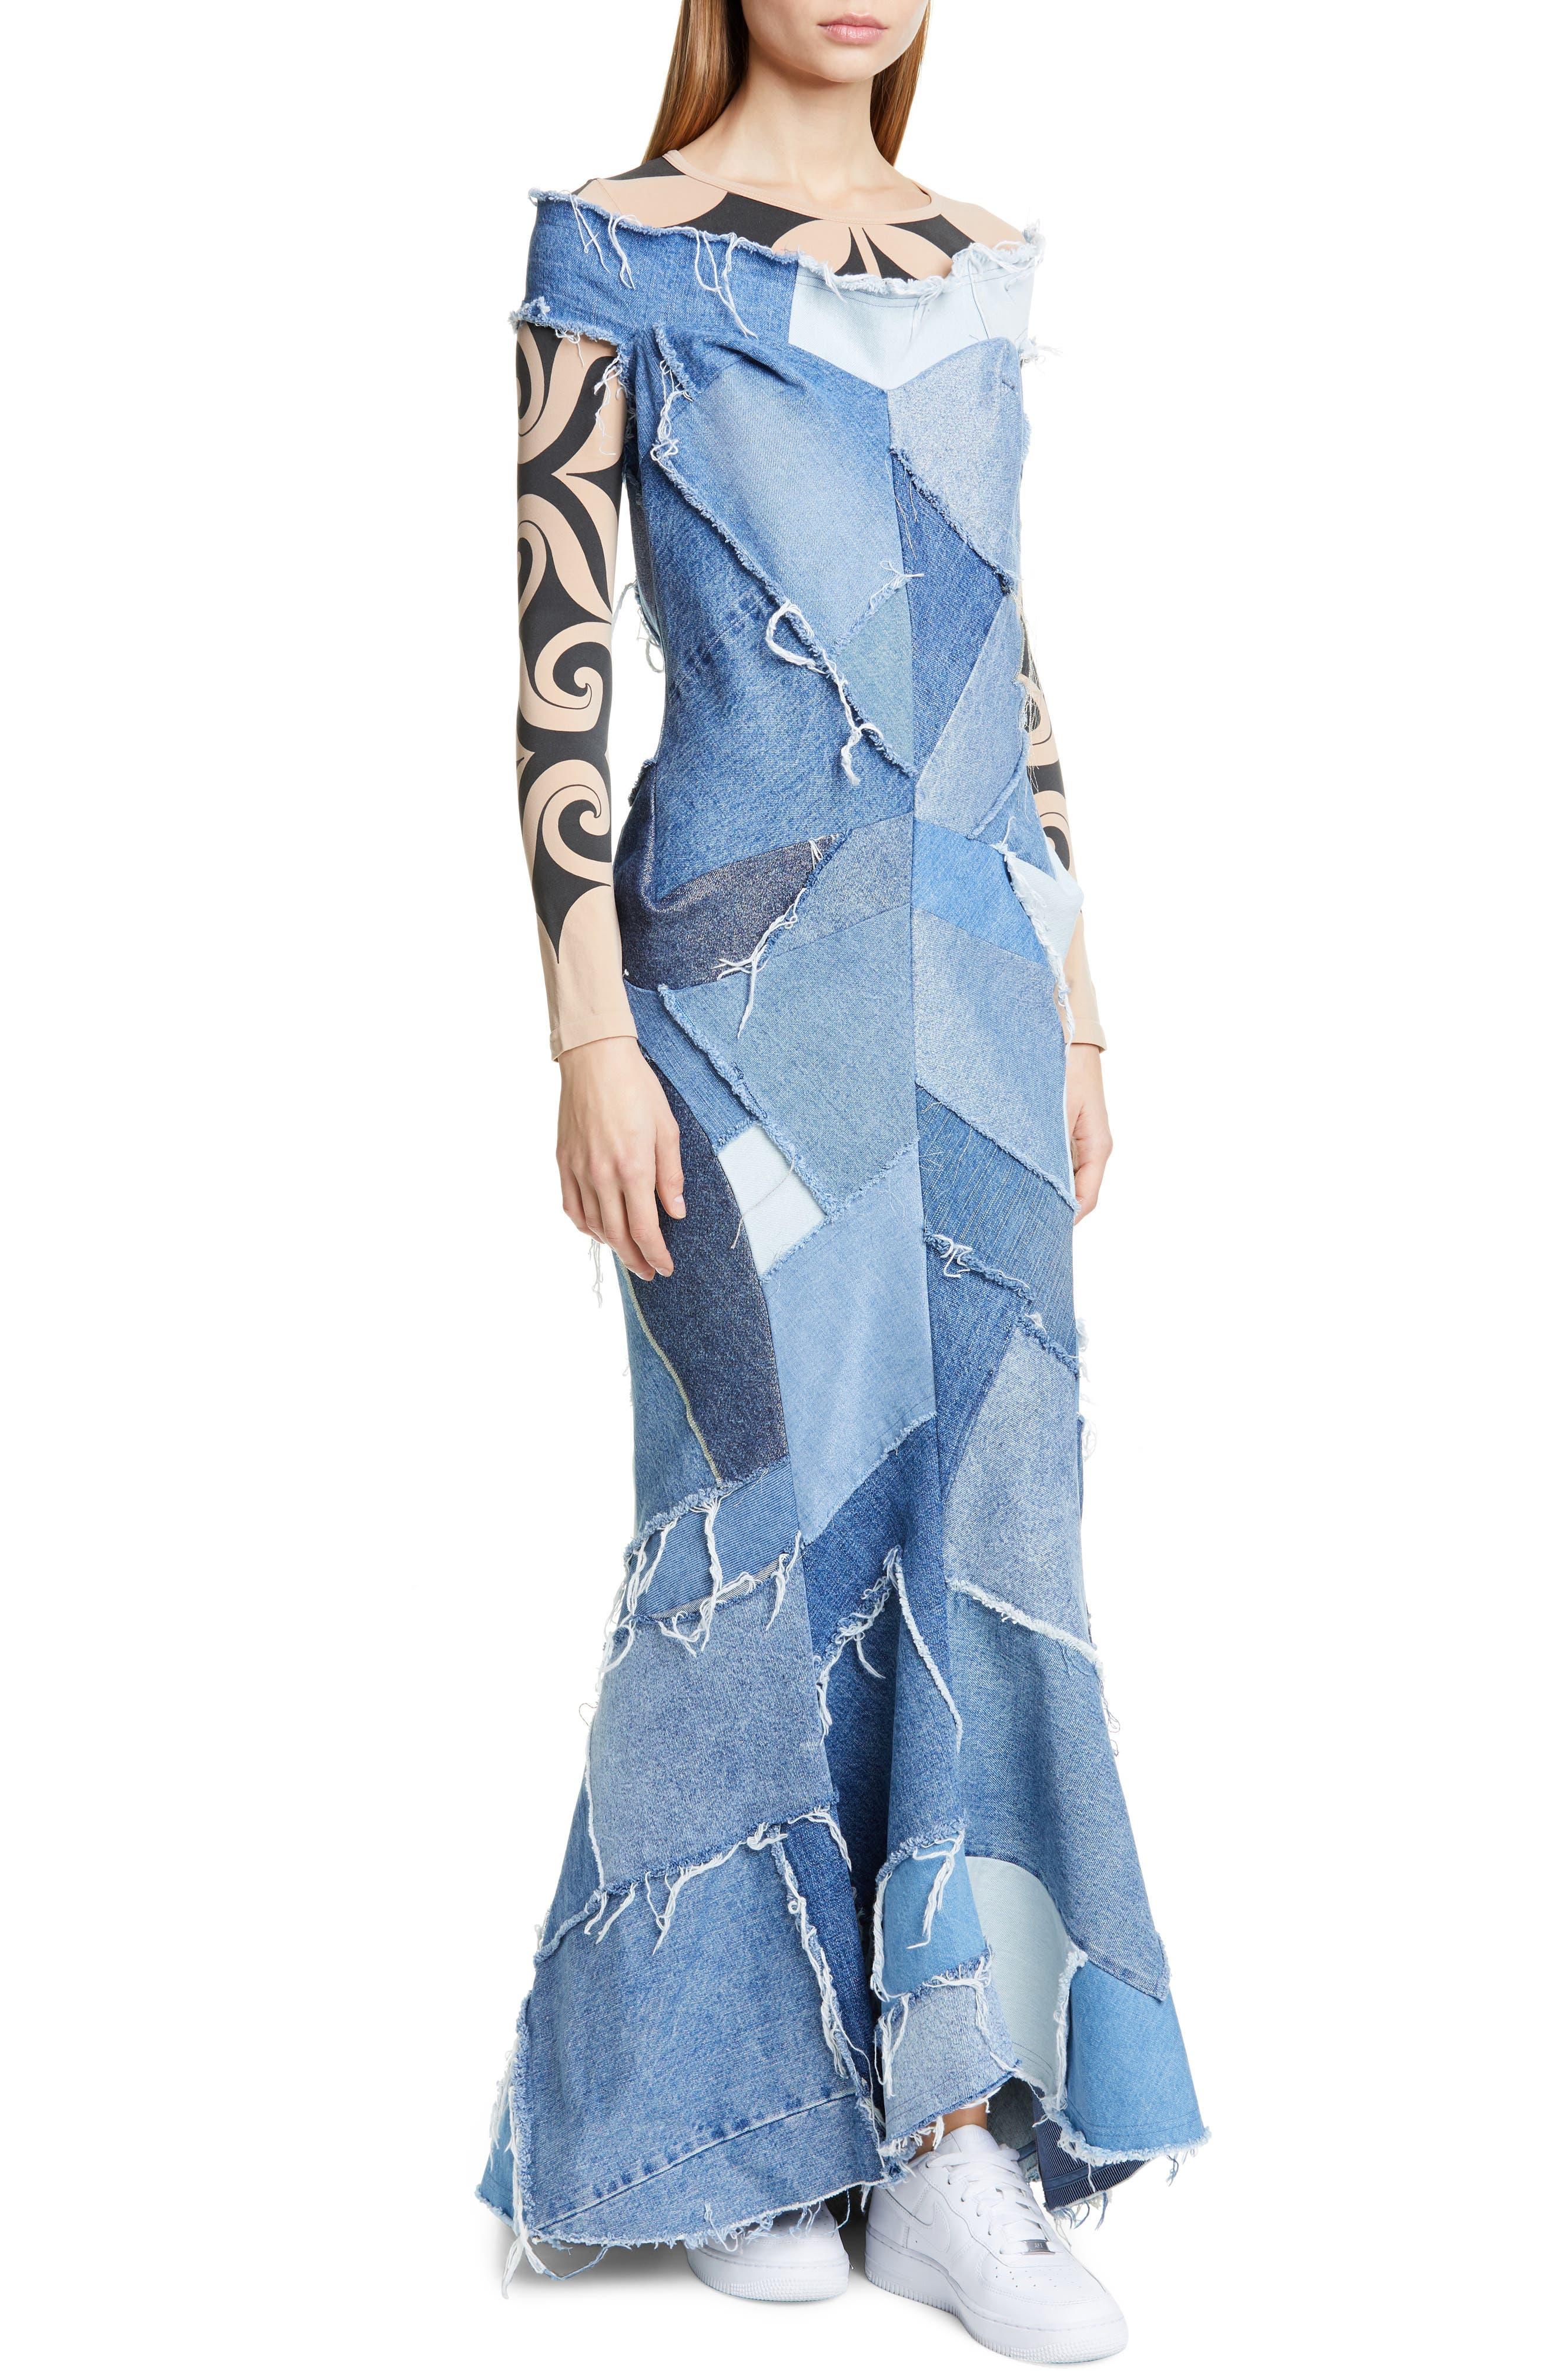 JUNYA WATANABE, Denim Patchwork Off the Shoulder Mermaid Dress, Alternate thumbnail 5, color, INDIGO